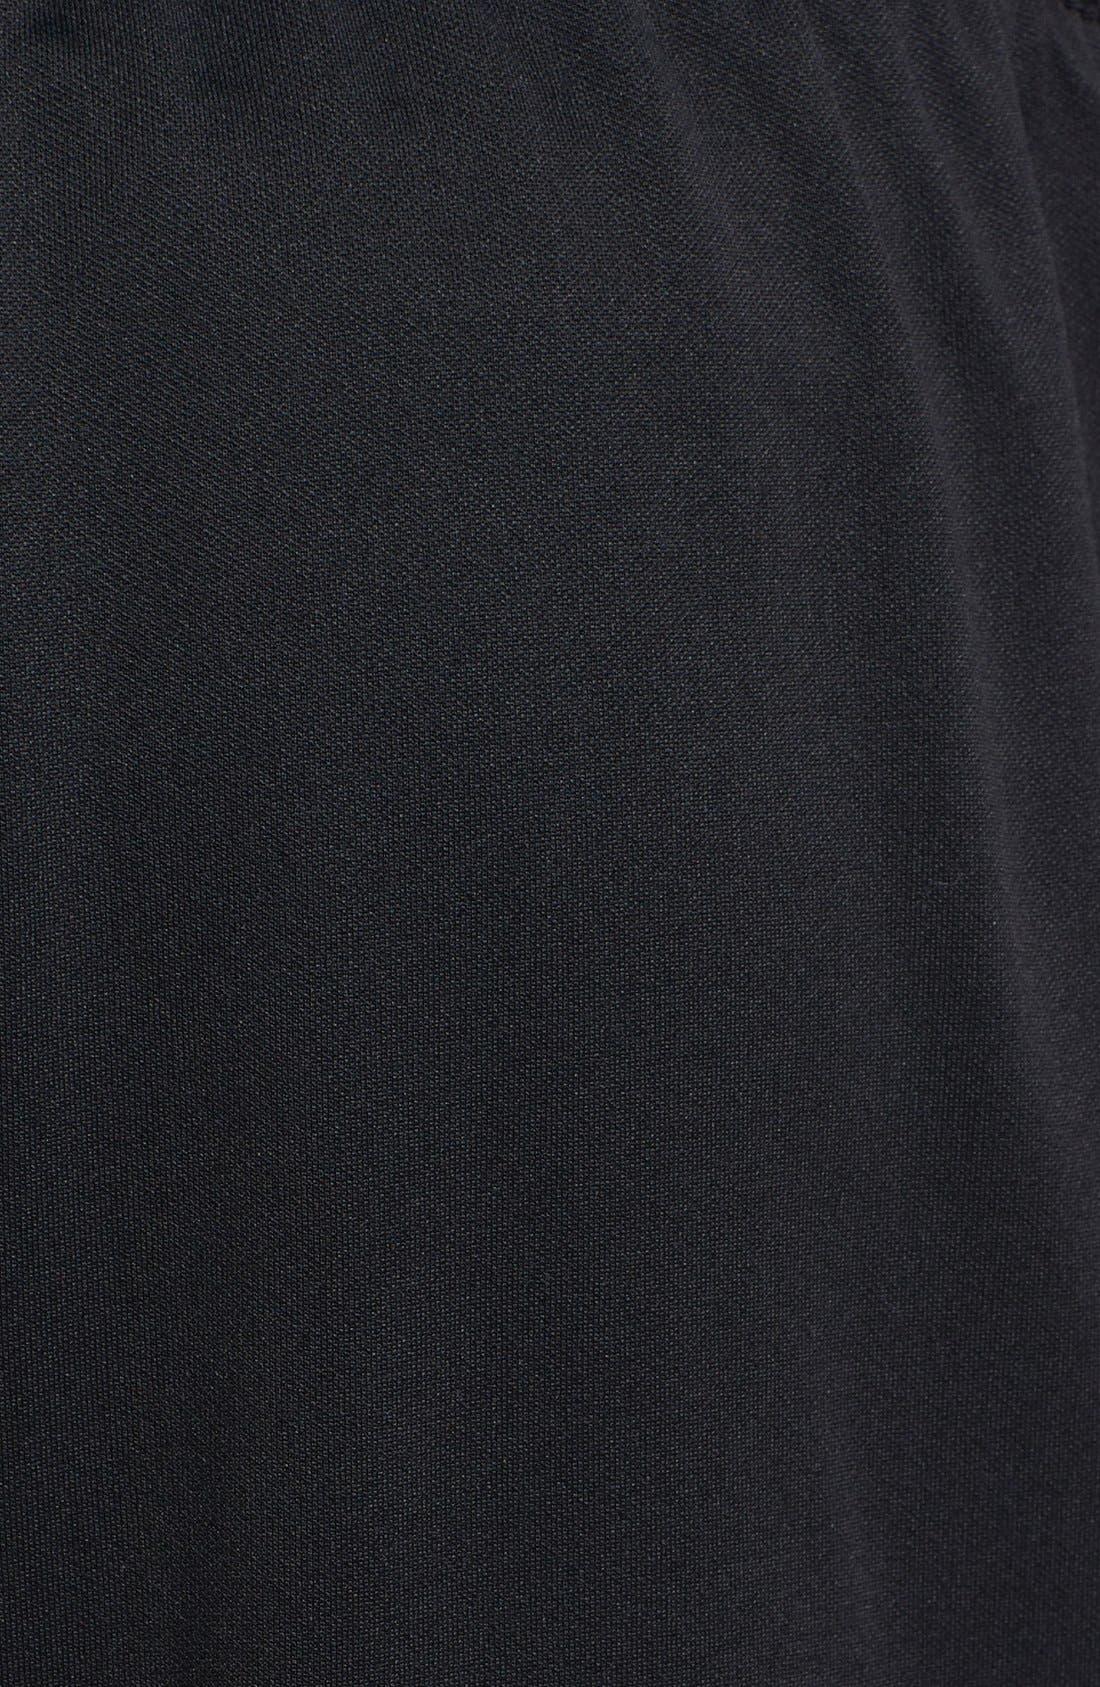 Alternate Image 3  - Athletic Recon 'Platoon' Knit Shorts